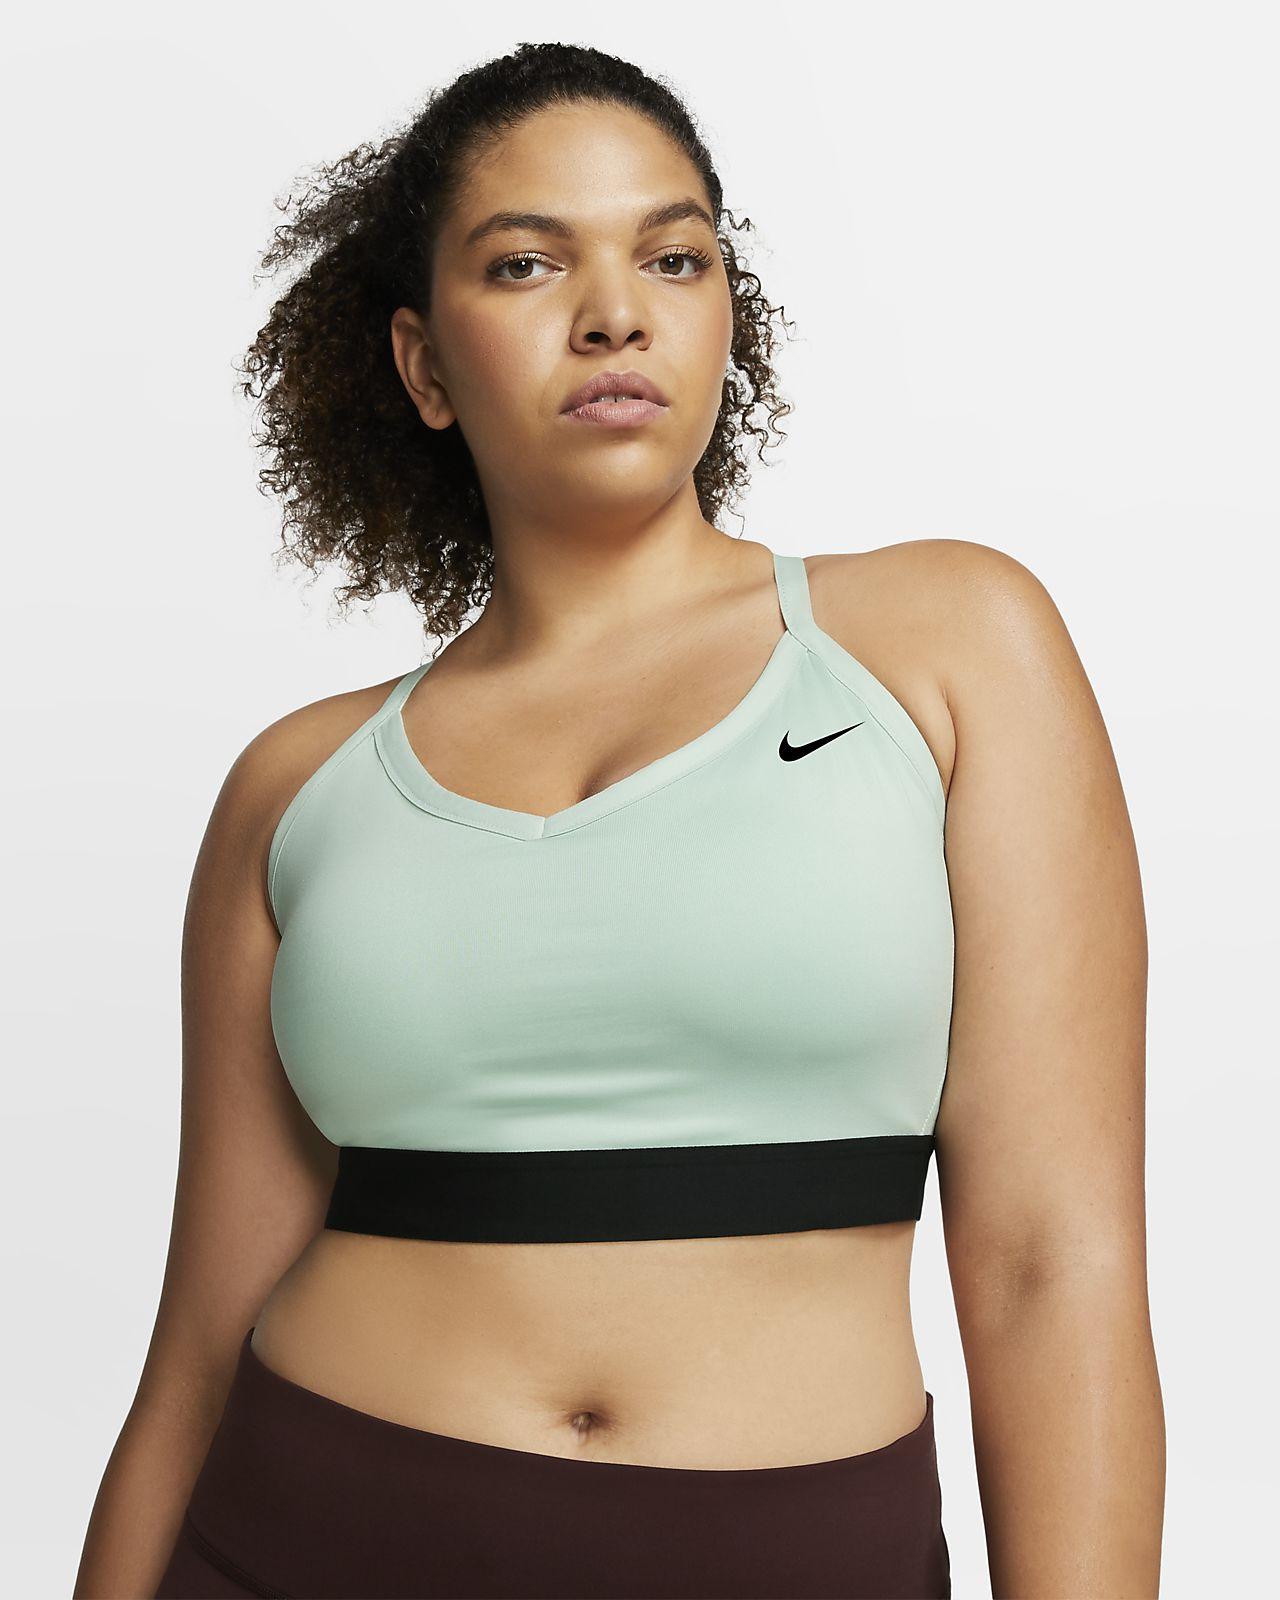 4b002f626f5 Nike Indy Women's Light-Support Sports Bra (Plus Size). Nike.com